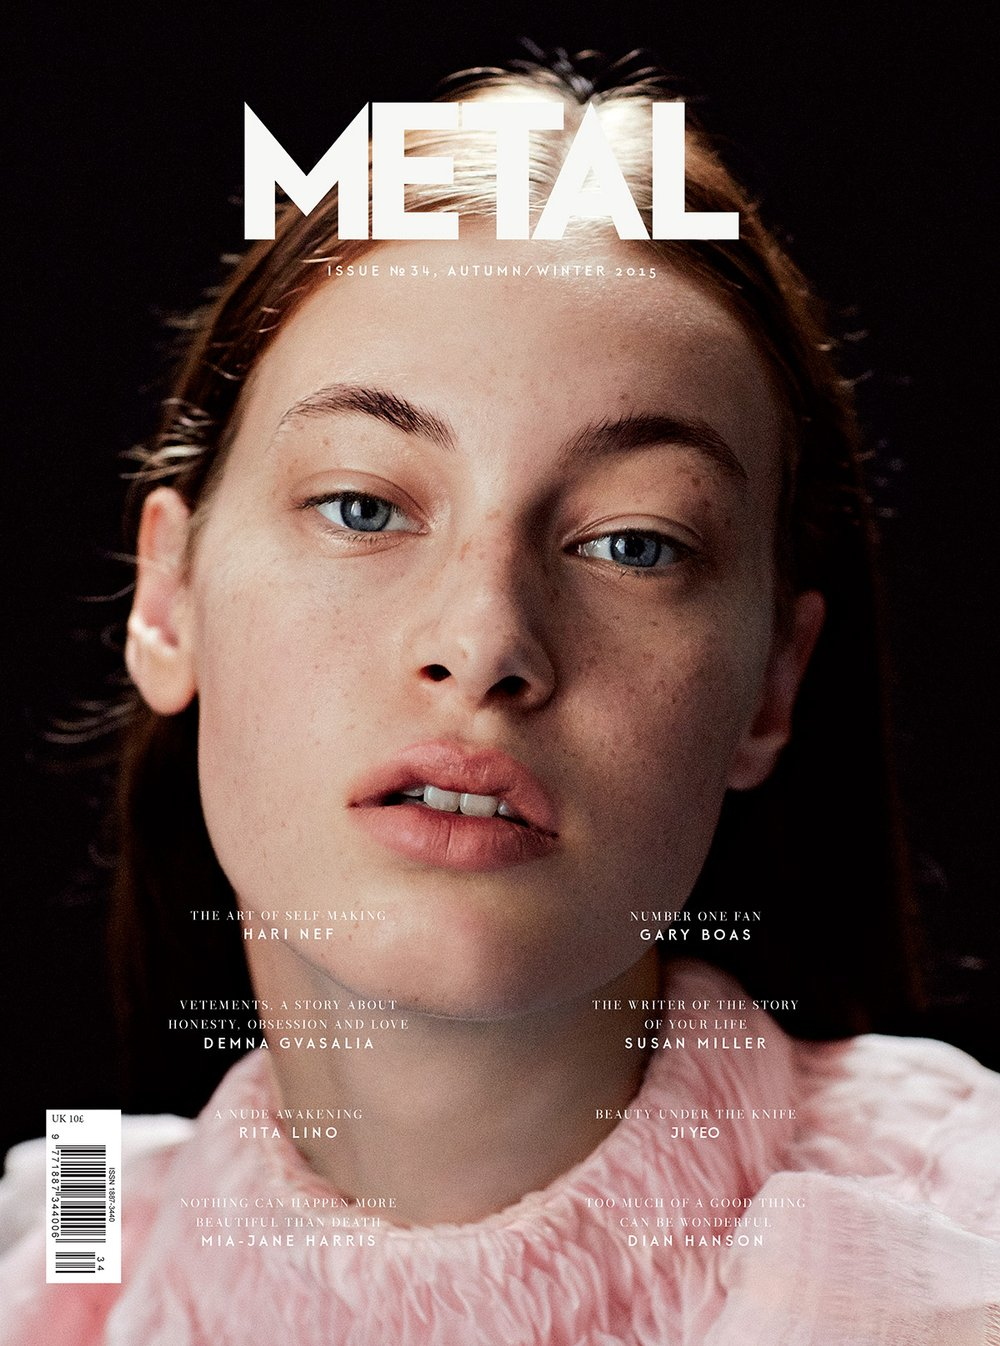 COVER 1 - Julia Leineweber (Oui Management) wearing Chanel by Raffaele Cariou.